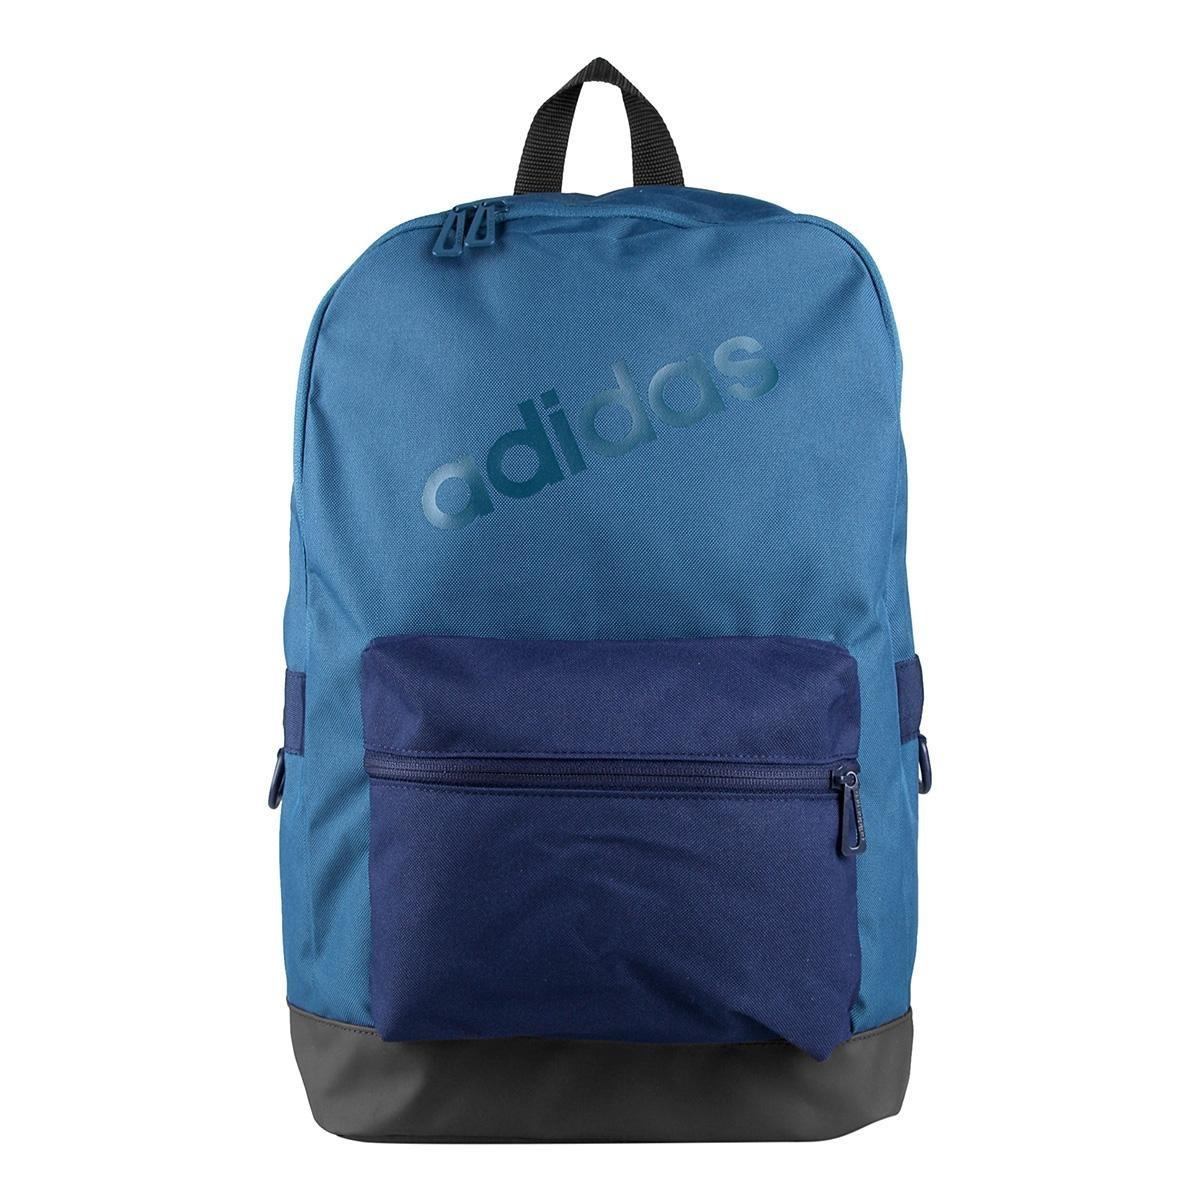 db27a7c6d60 Mochila Adidas Daily - Compre Agora